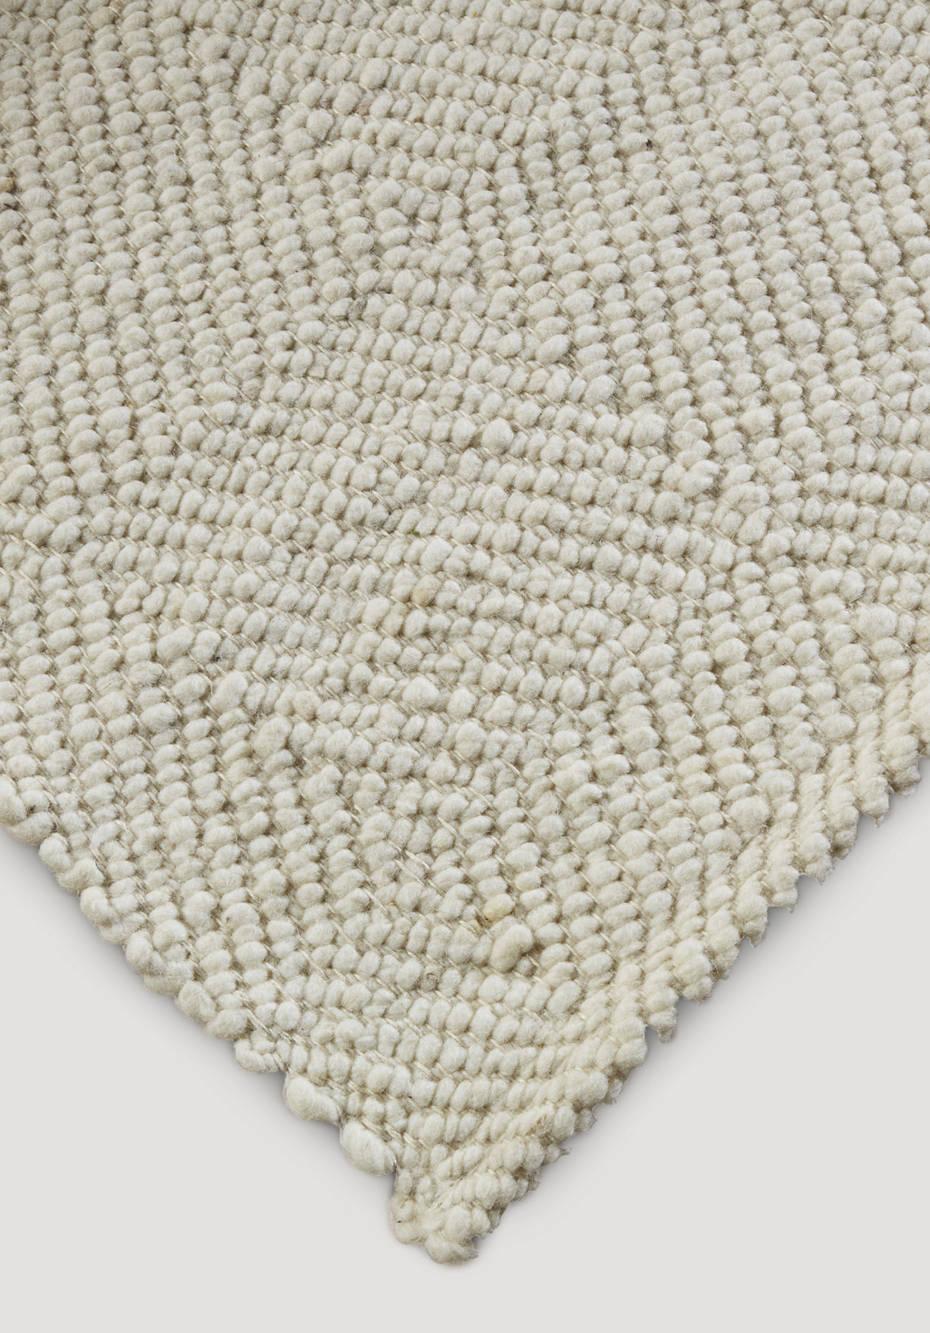 Virgin wool ruga from the dyke sheep